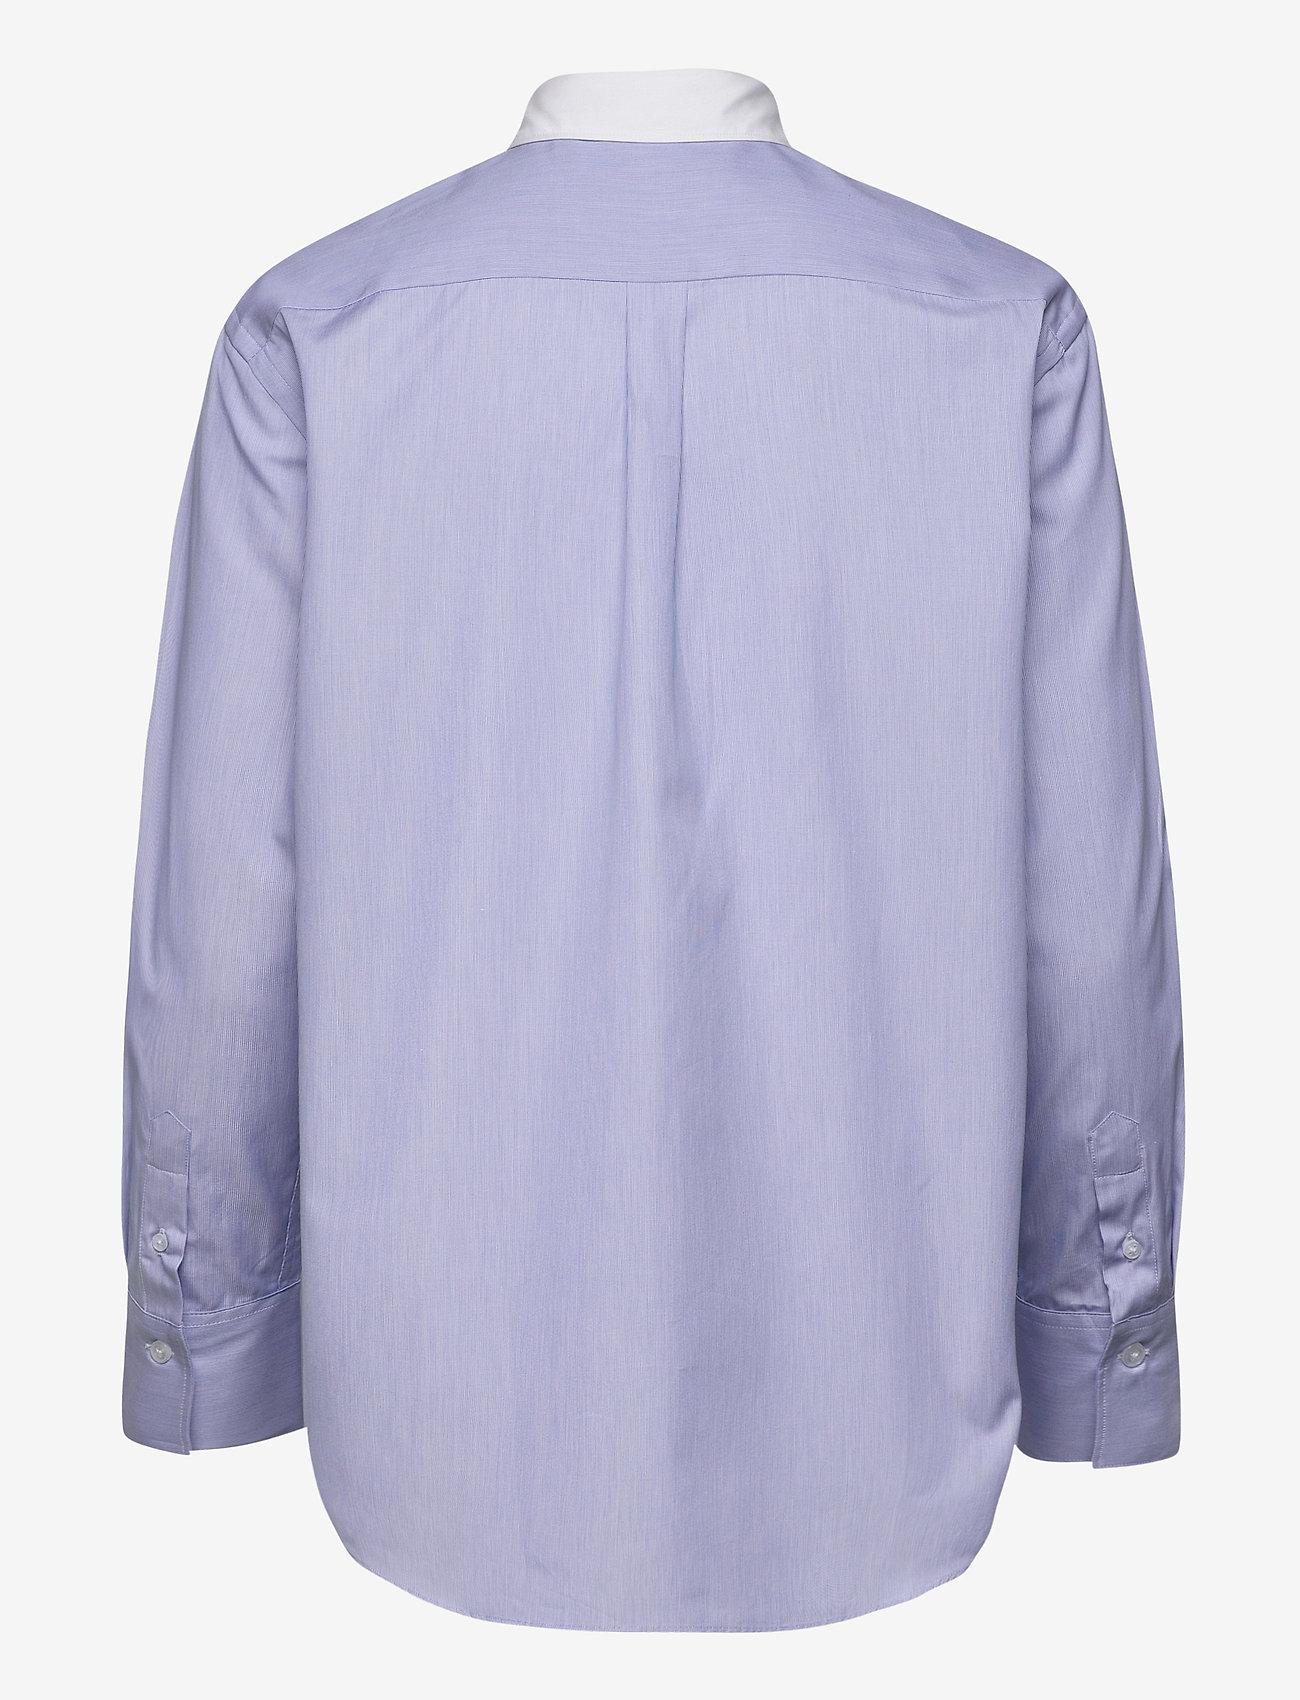 SAND - 8753 - Nube C - långärmade skjortor - blue - 1